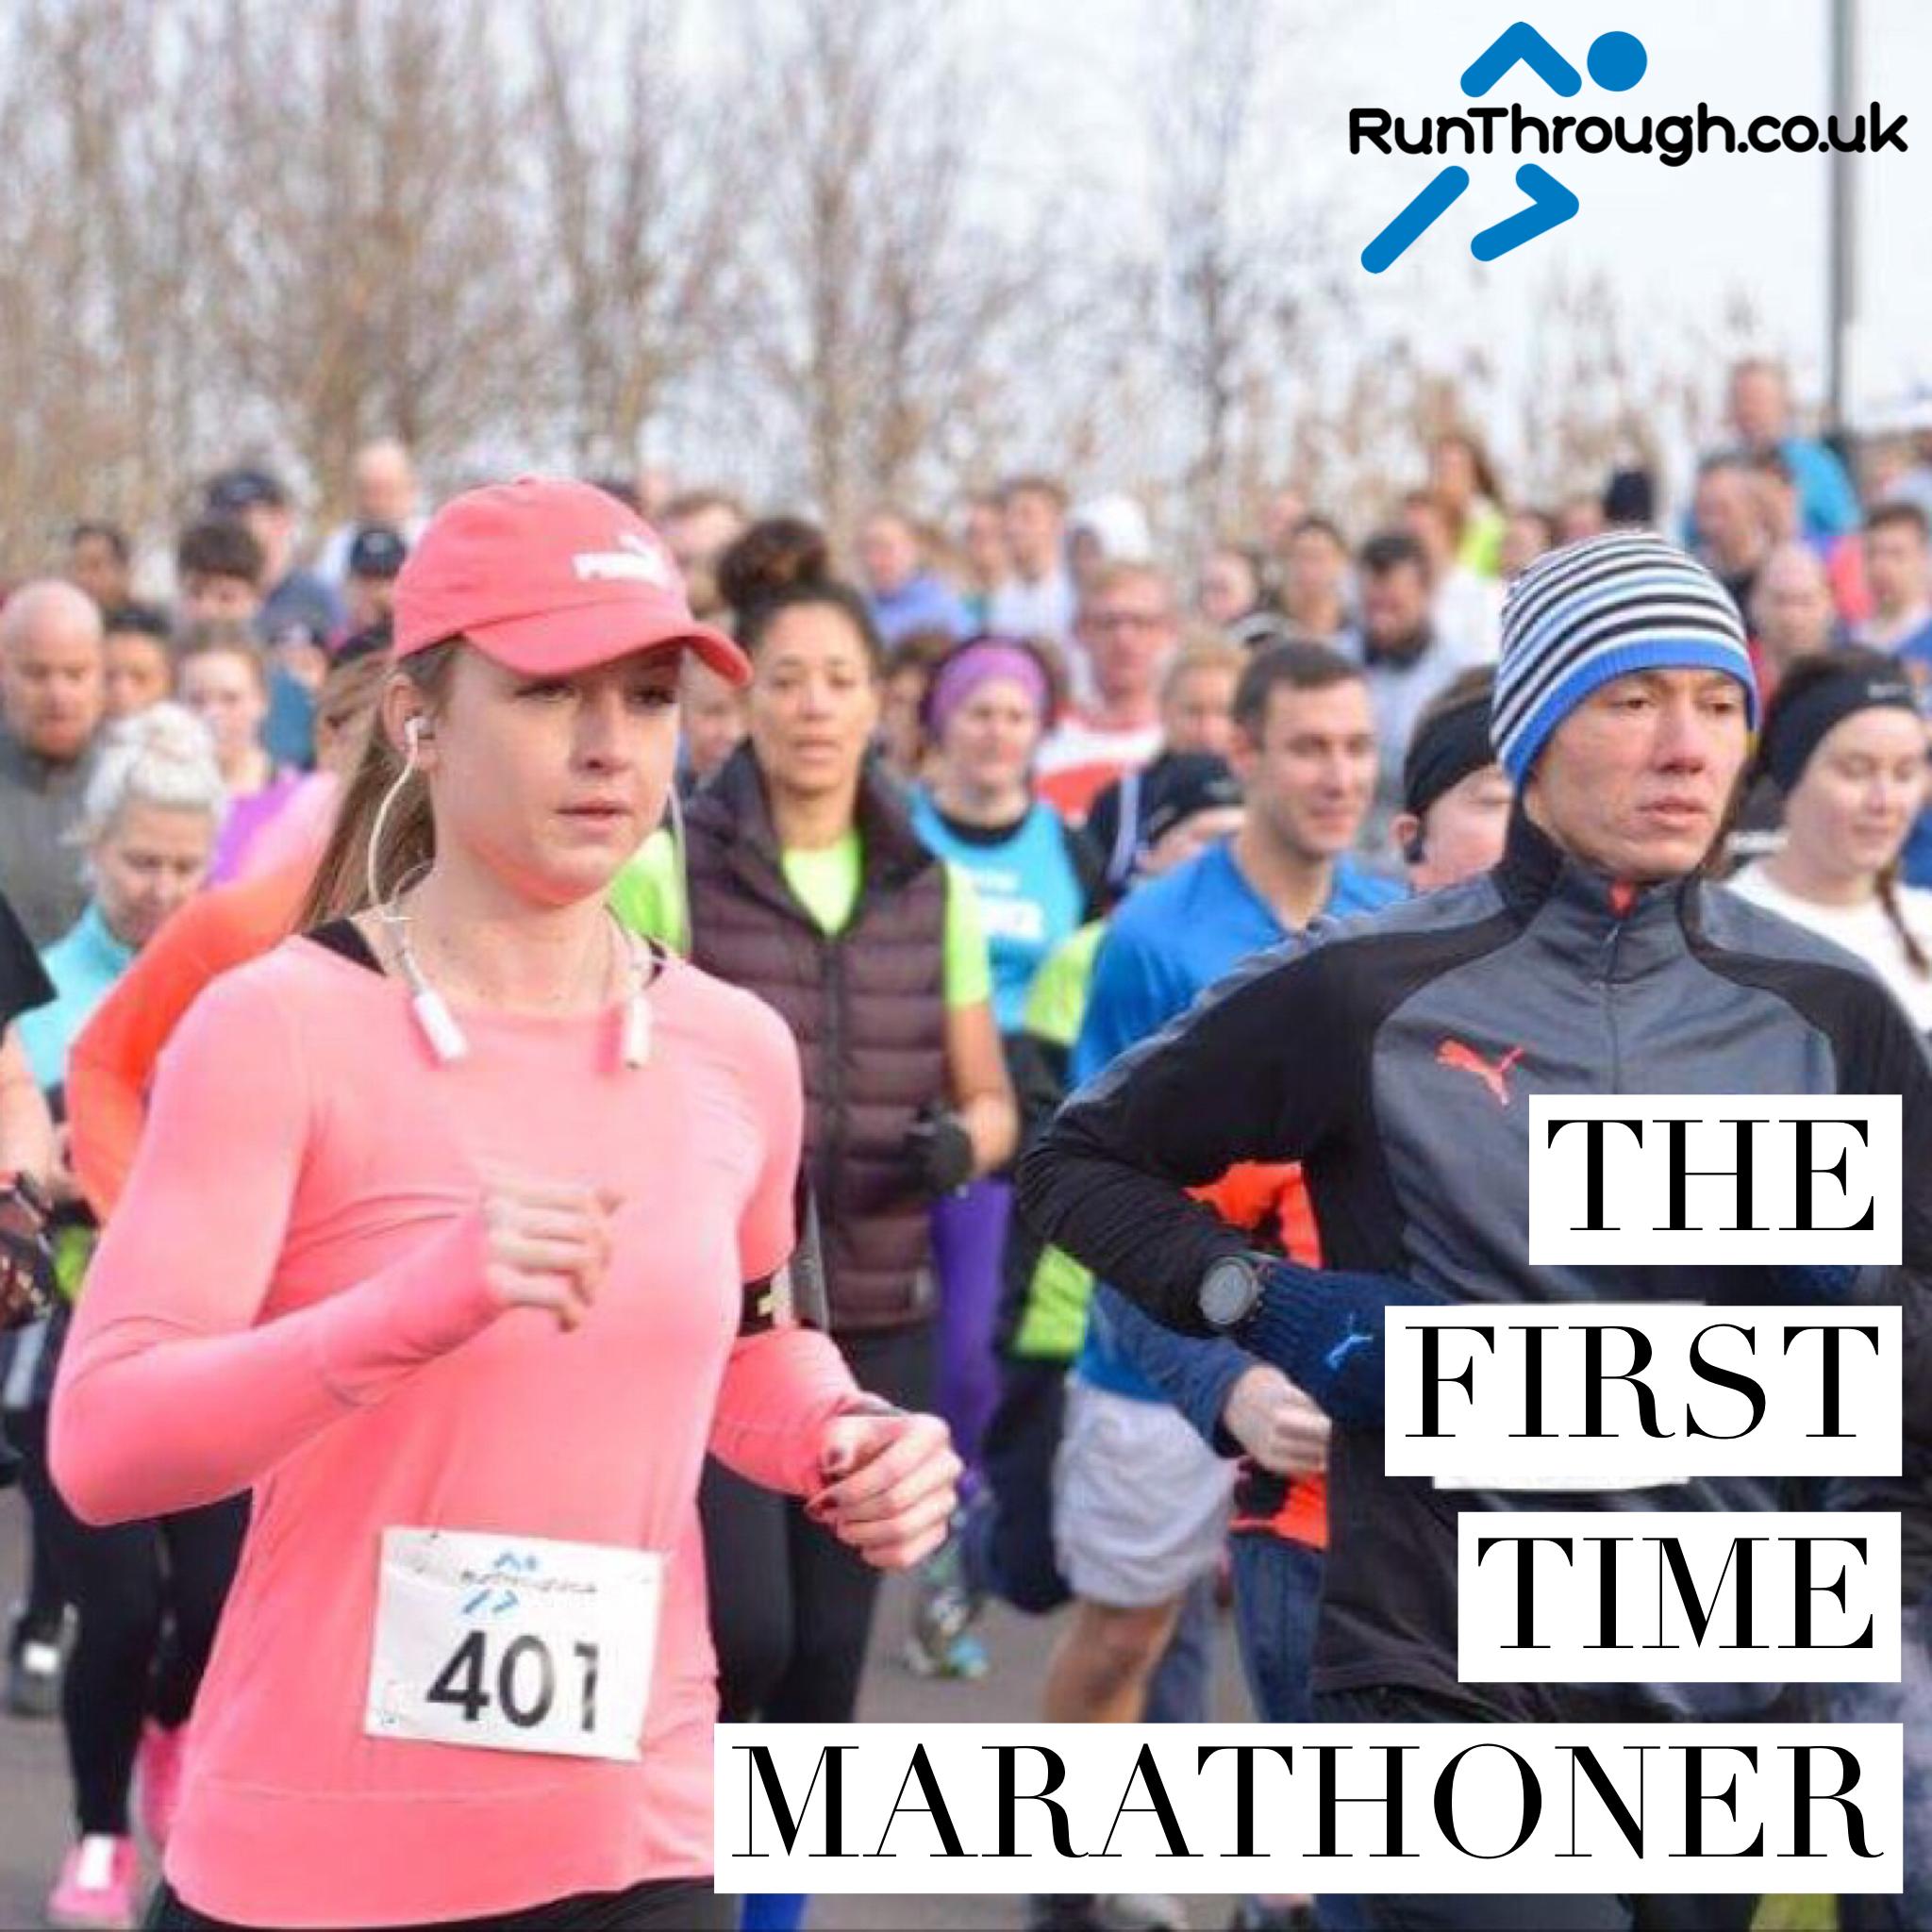 The first time marathon runner